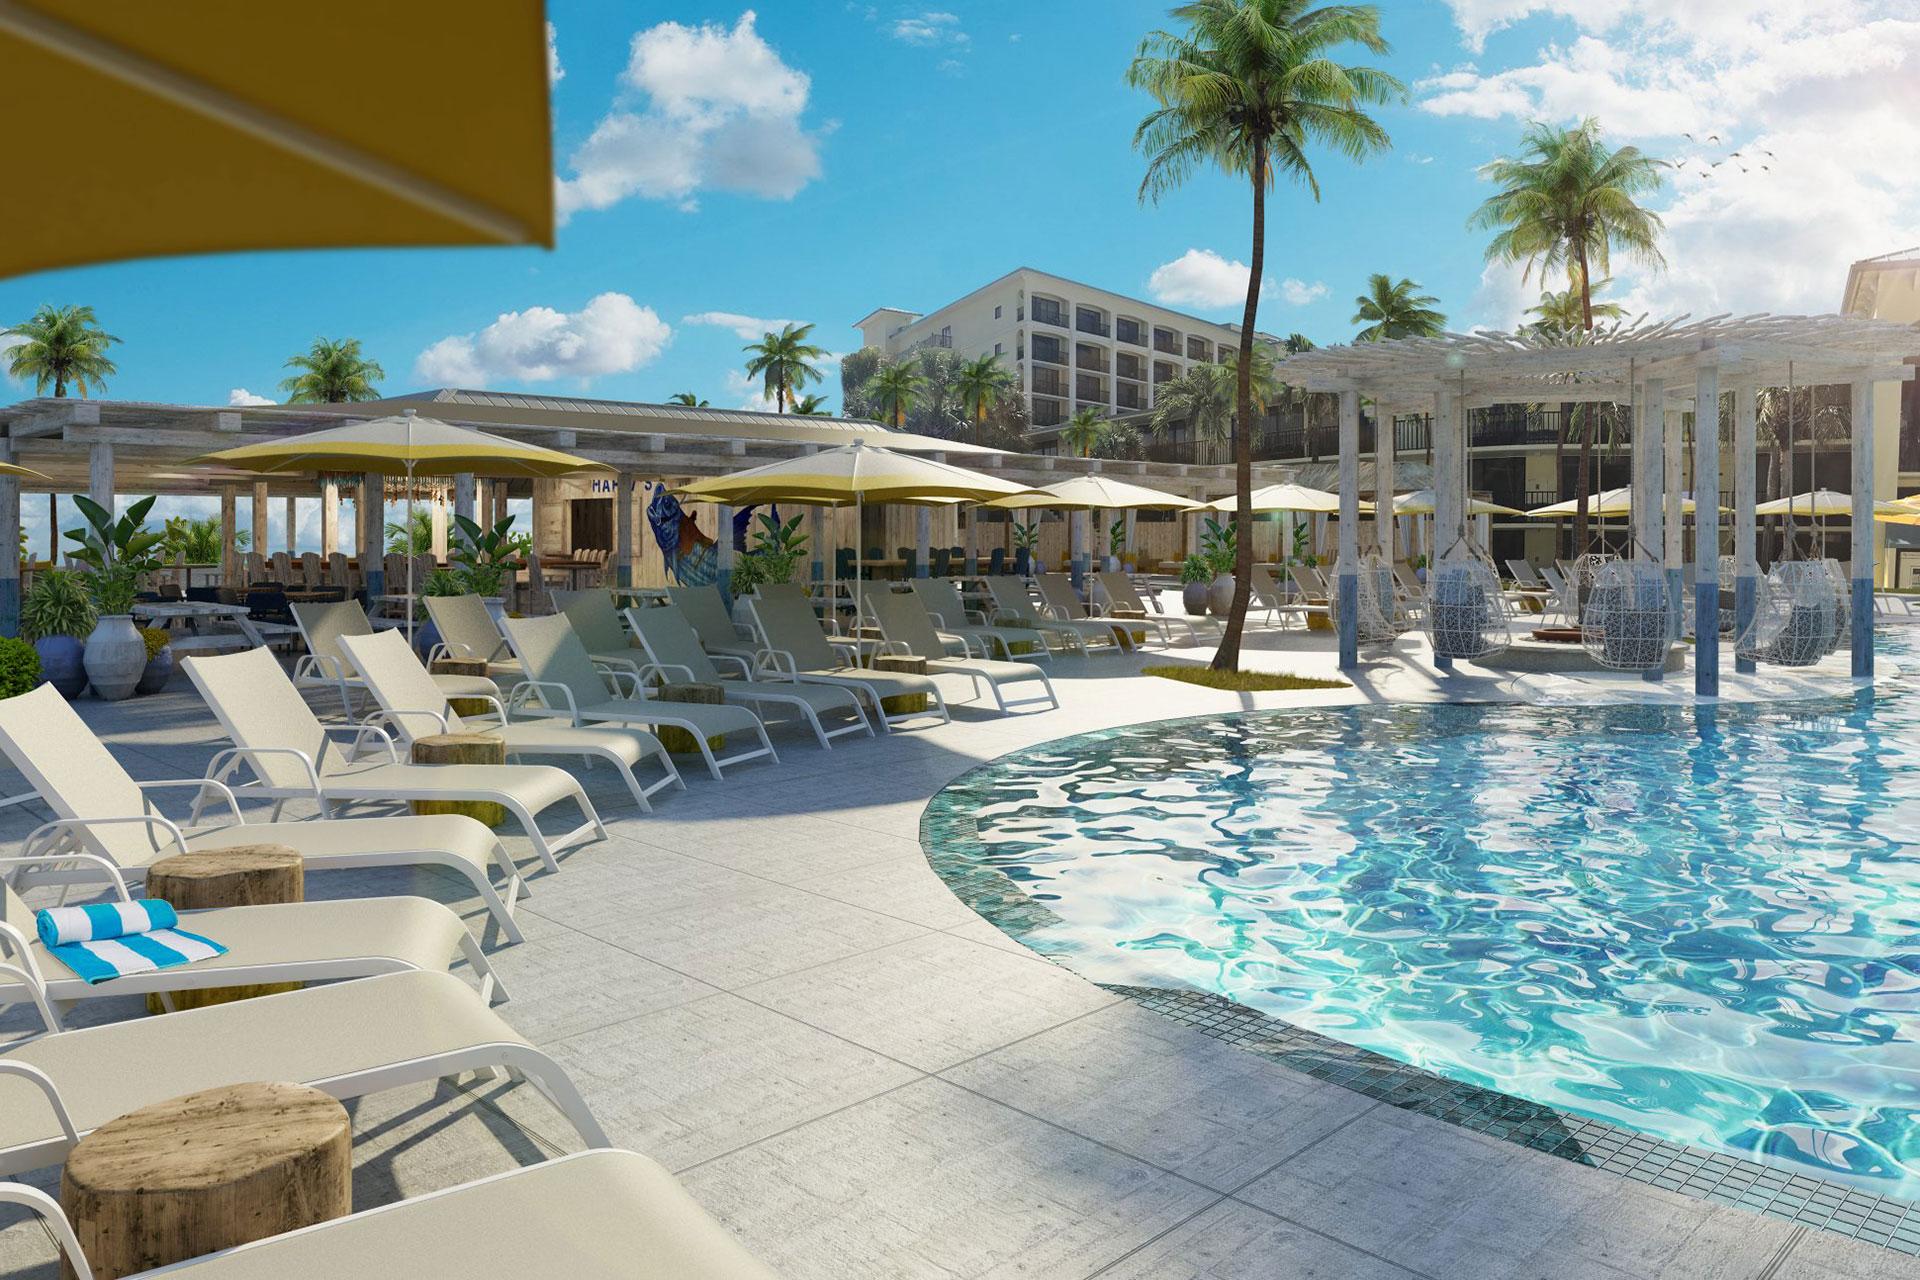 Pool at Sirata Beach Resort in St. Pete Beach, FL